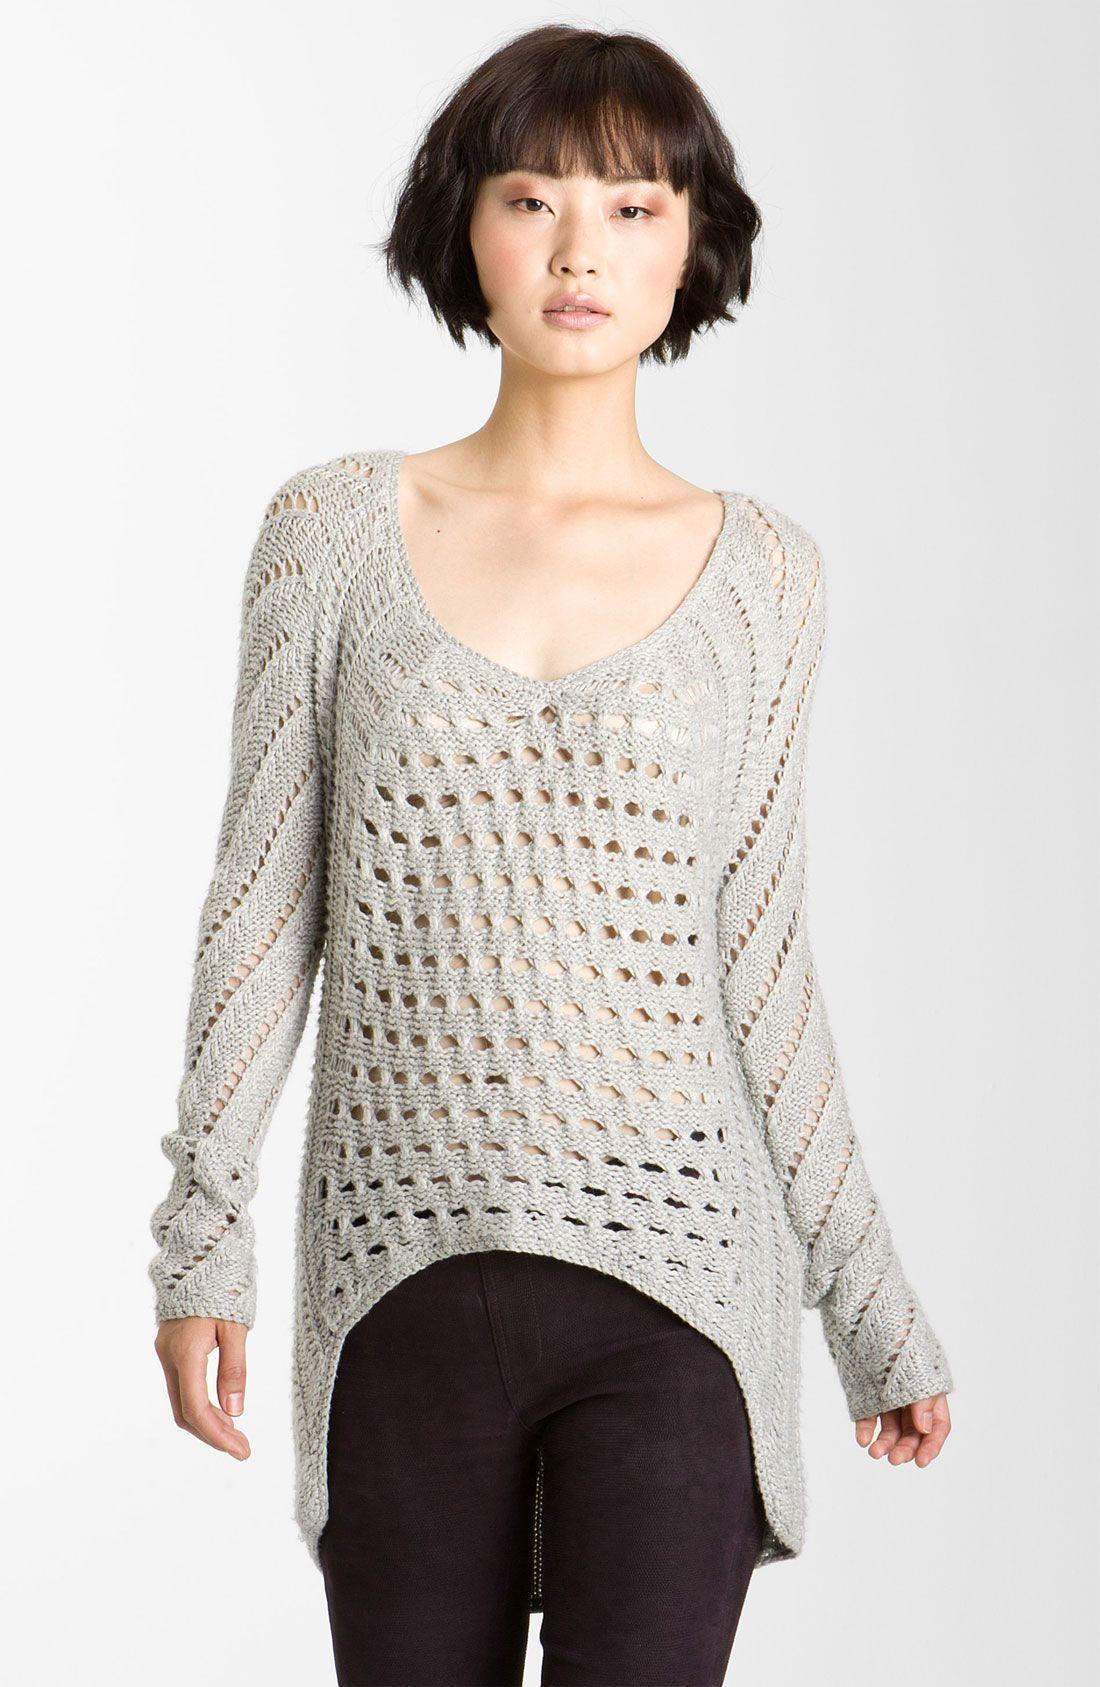 Helmut Lang \'Inherent Texture\' Knit Sweater   Nordstrom   ₲lamorous ...